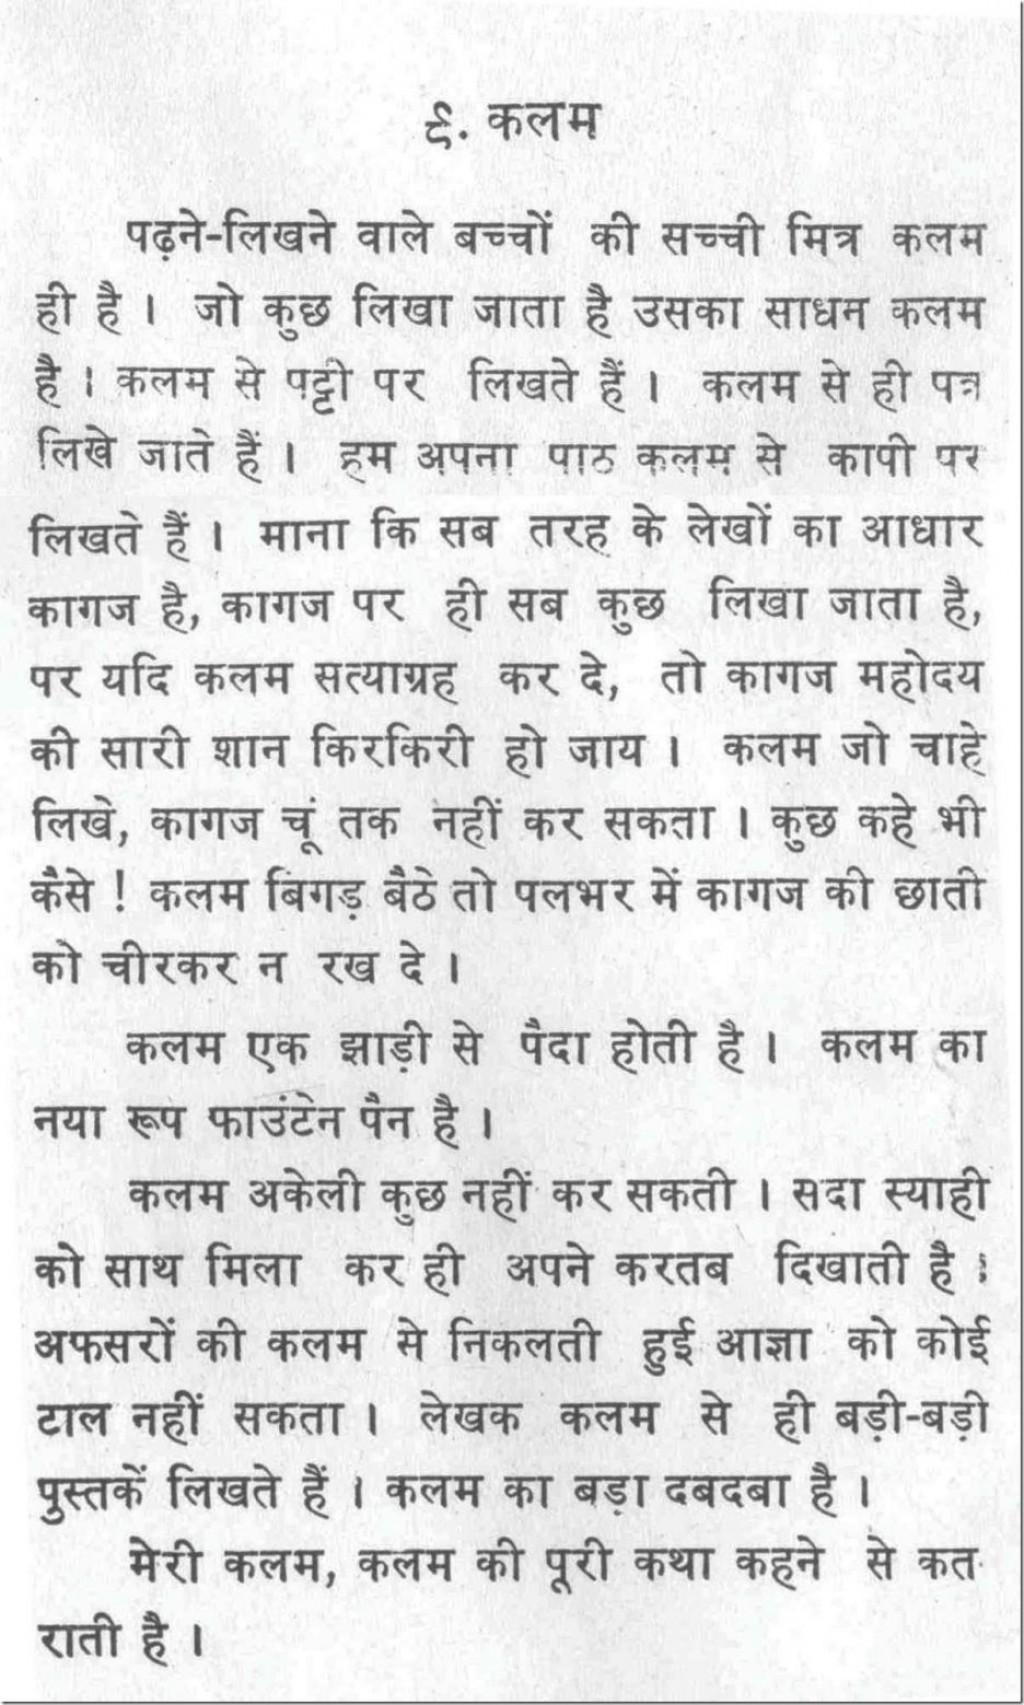 013 Essay On Bhagat Singh In Marathi Example Hindi Thumb Short Telugu English Language Sanskrit Words Urdu Punjabi Kannada Unique 100 Large